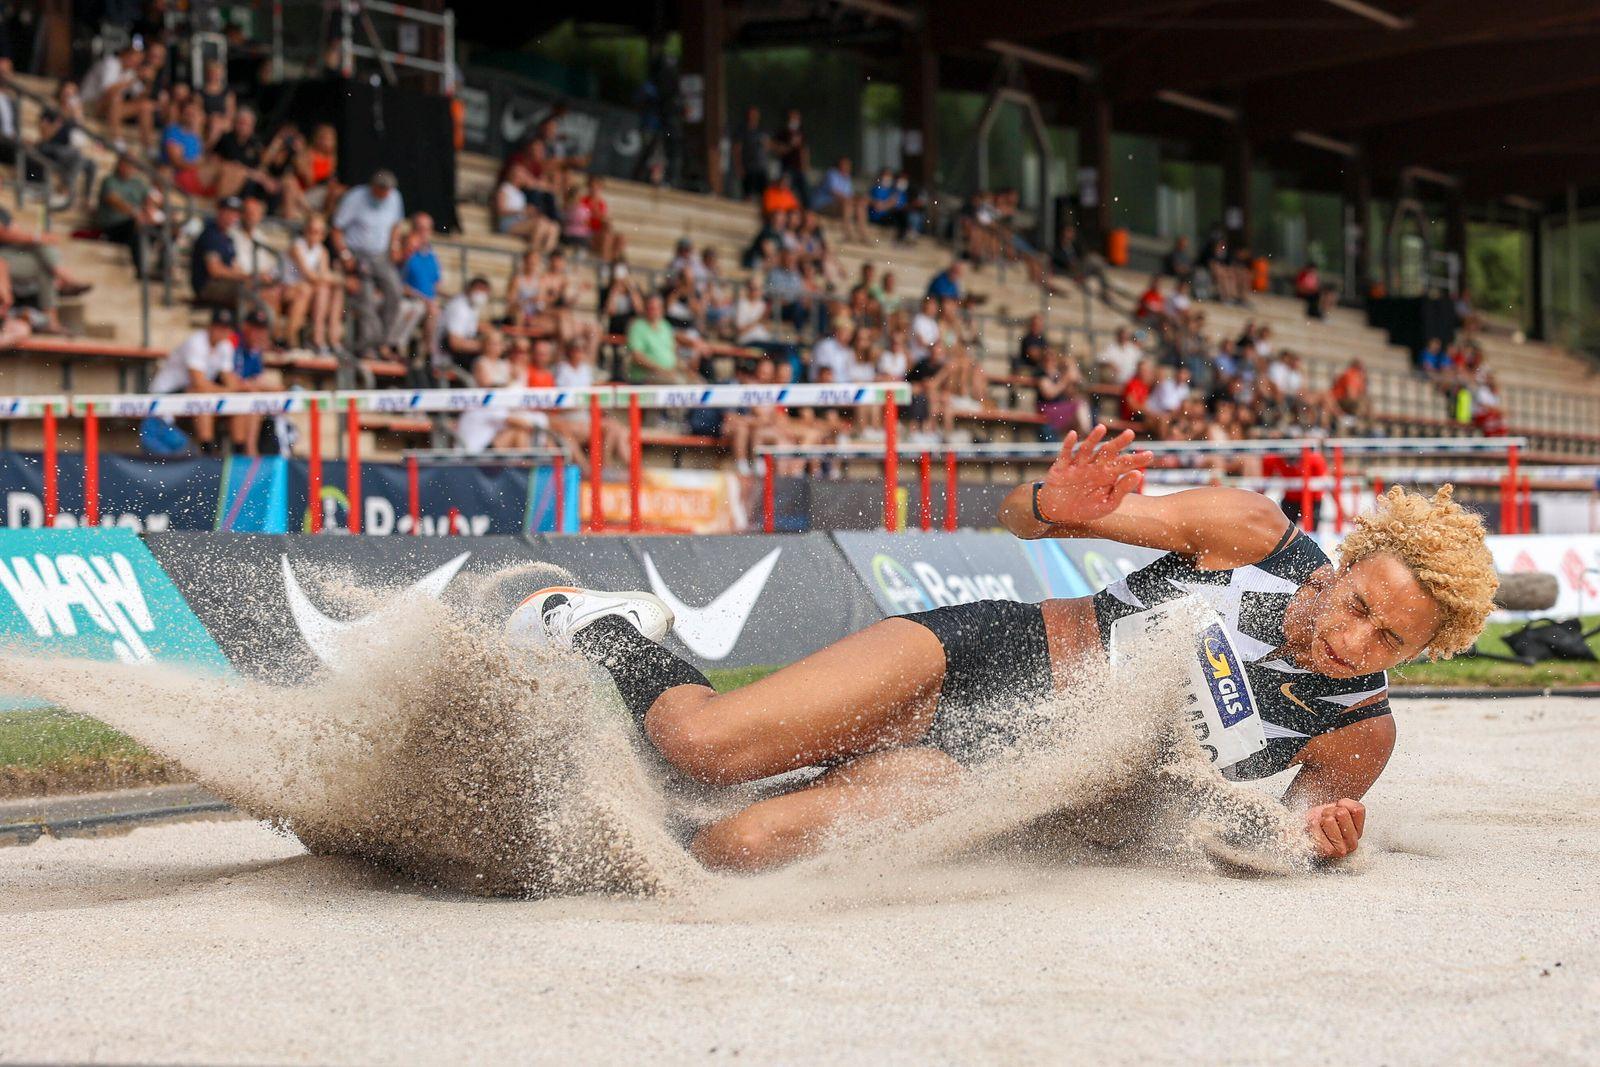 True Athletes Classics; Leverkusen, 27.06.2021 6,92m - Malaika Mihambo (LG Kurpfalz); True Athletes Classics am 27.06.2